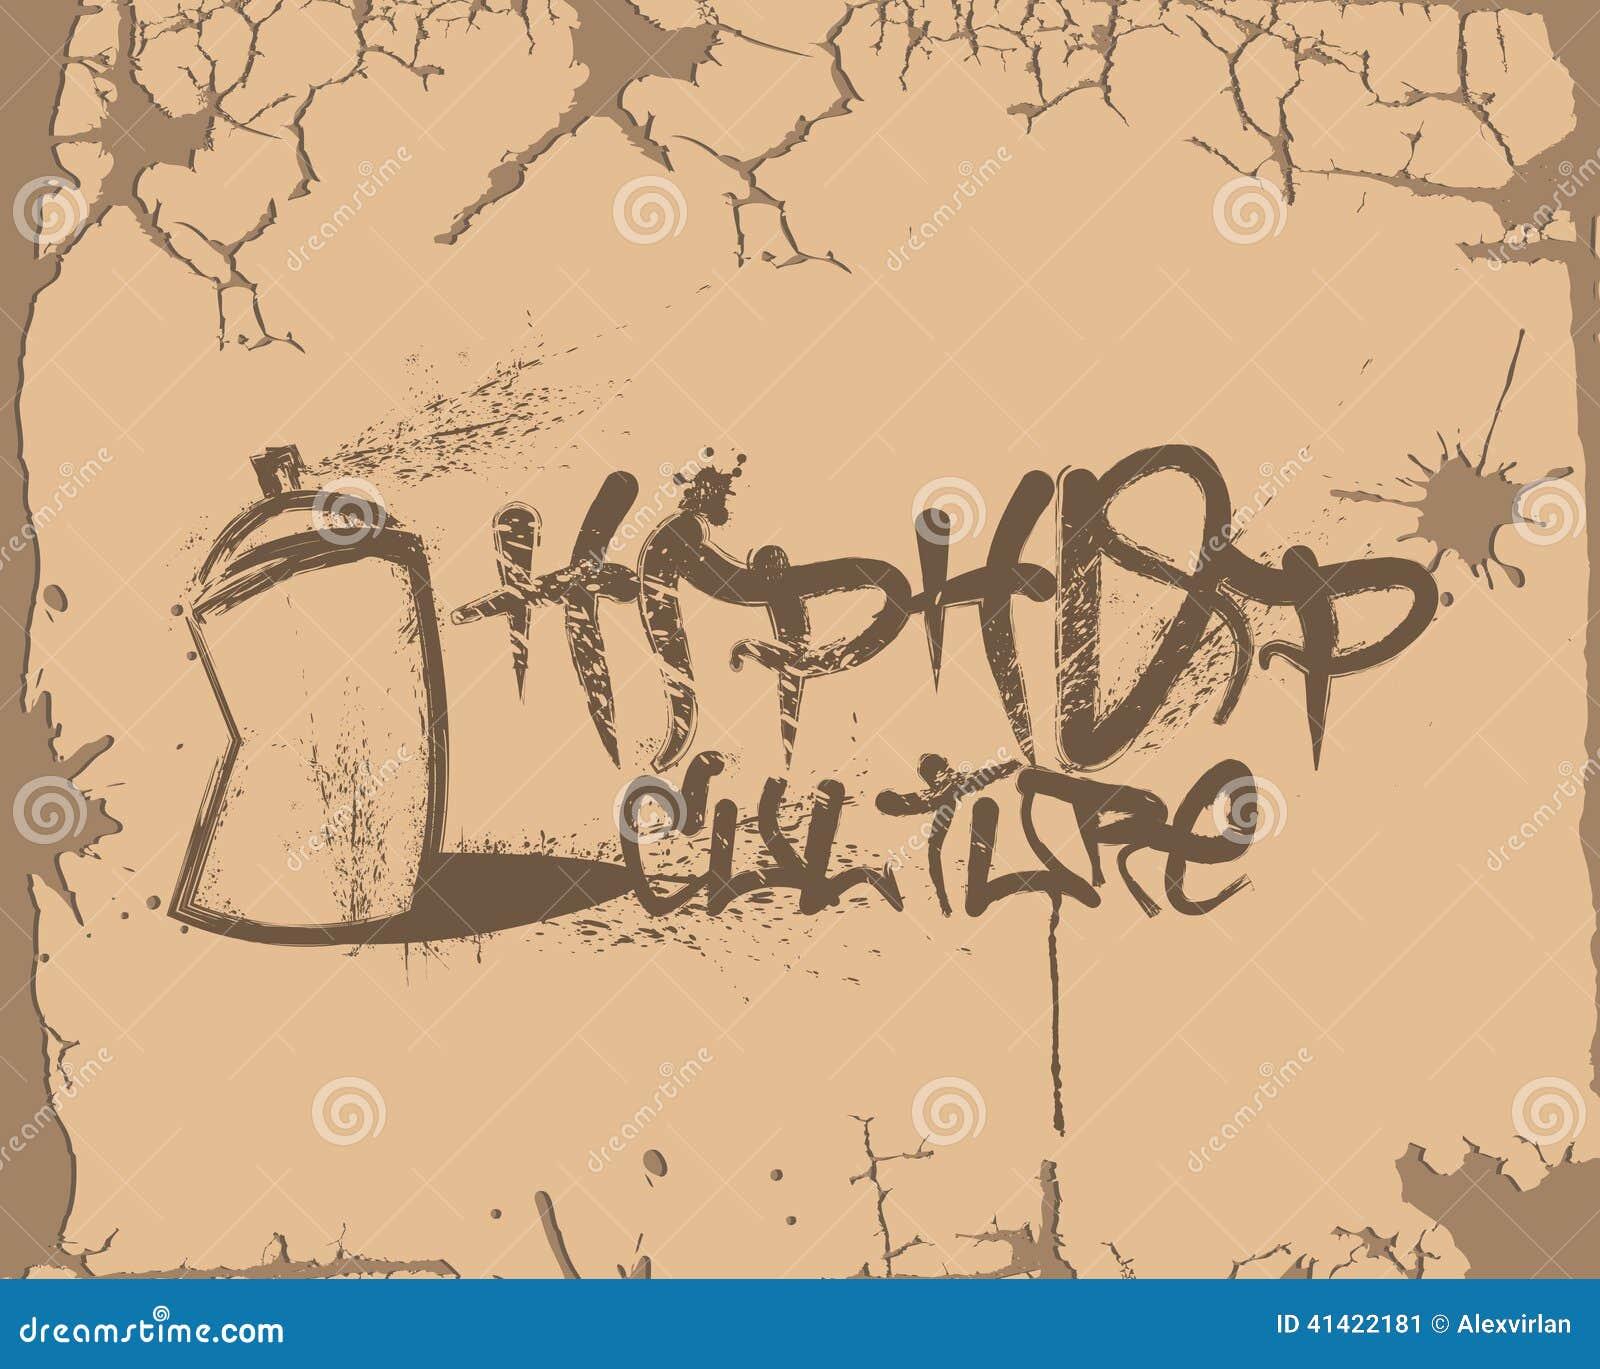 graffiti hip hop culture